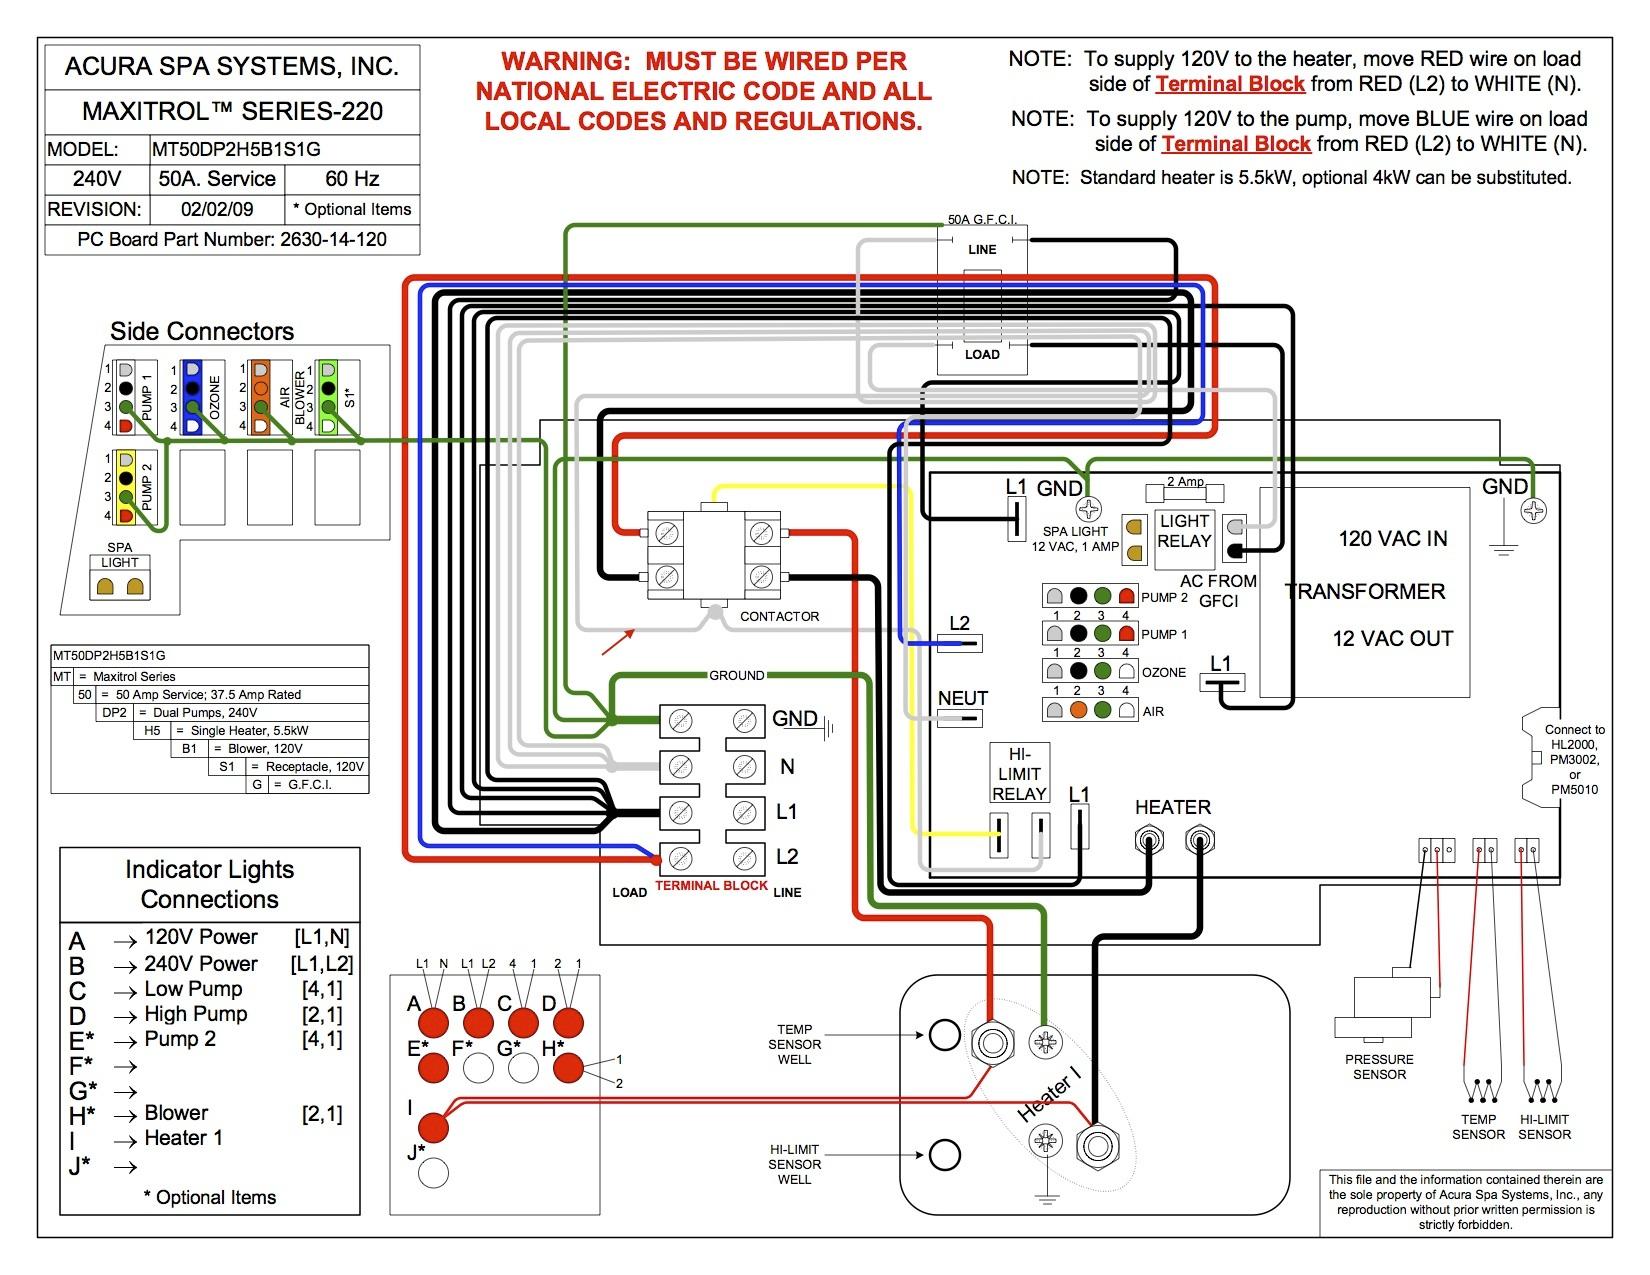 Spa Schematic Diagram Manual E Books 87 Mercury Grand Marquis Fuse Box Acura Wiring Databaseacura Megatrol Mt50dp2h5b1s1g Twinsprings Research Austin Healey